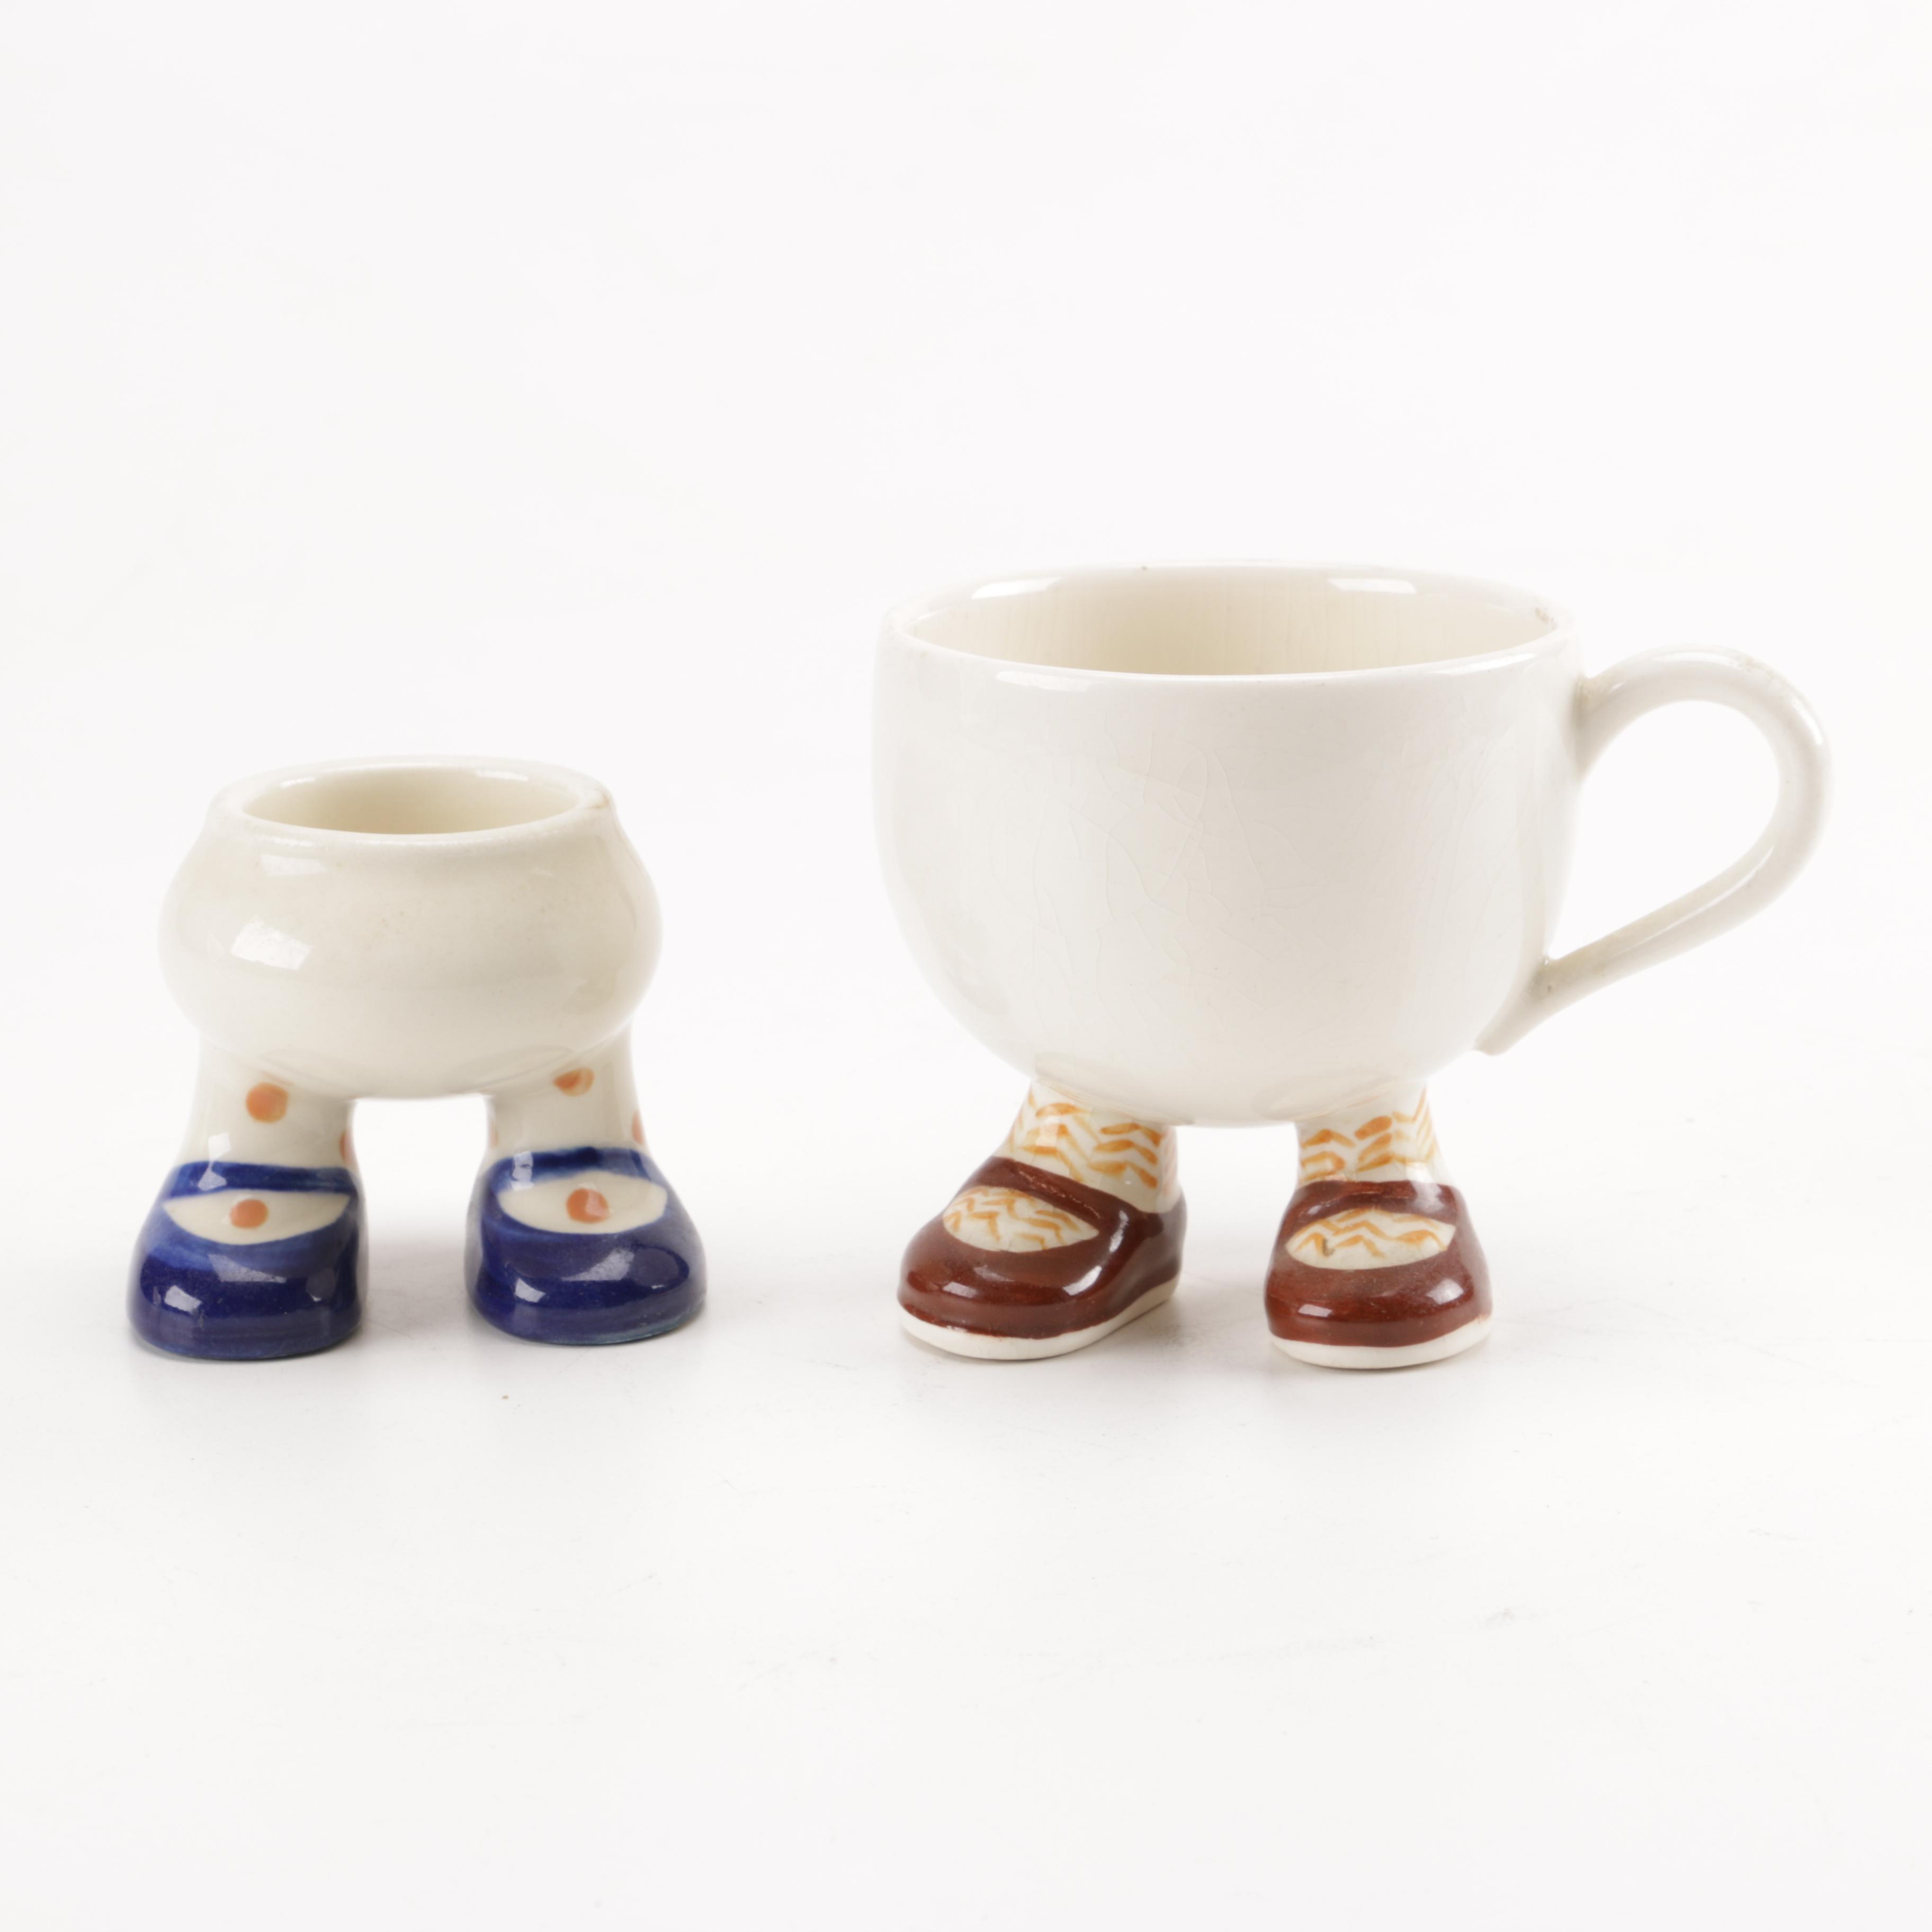 Vintage Carlton Walking Ware Egg Cup and Teacup